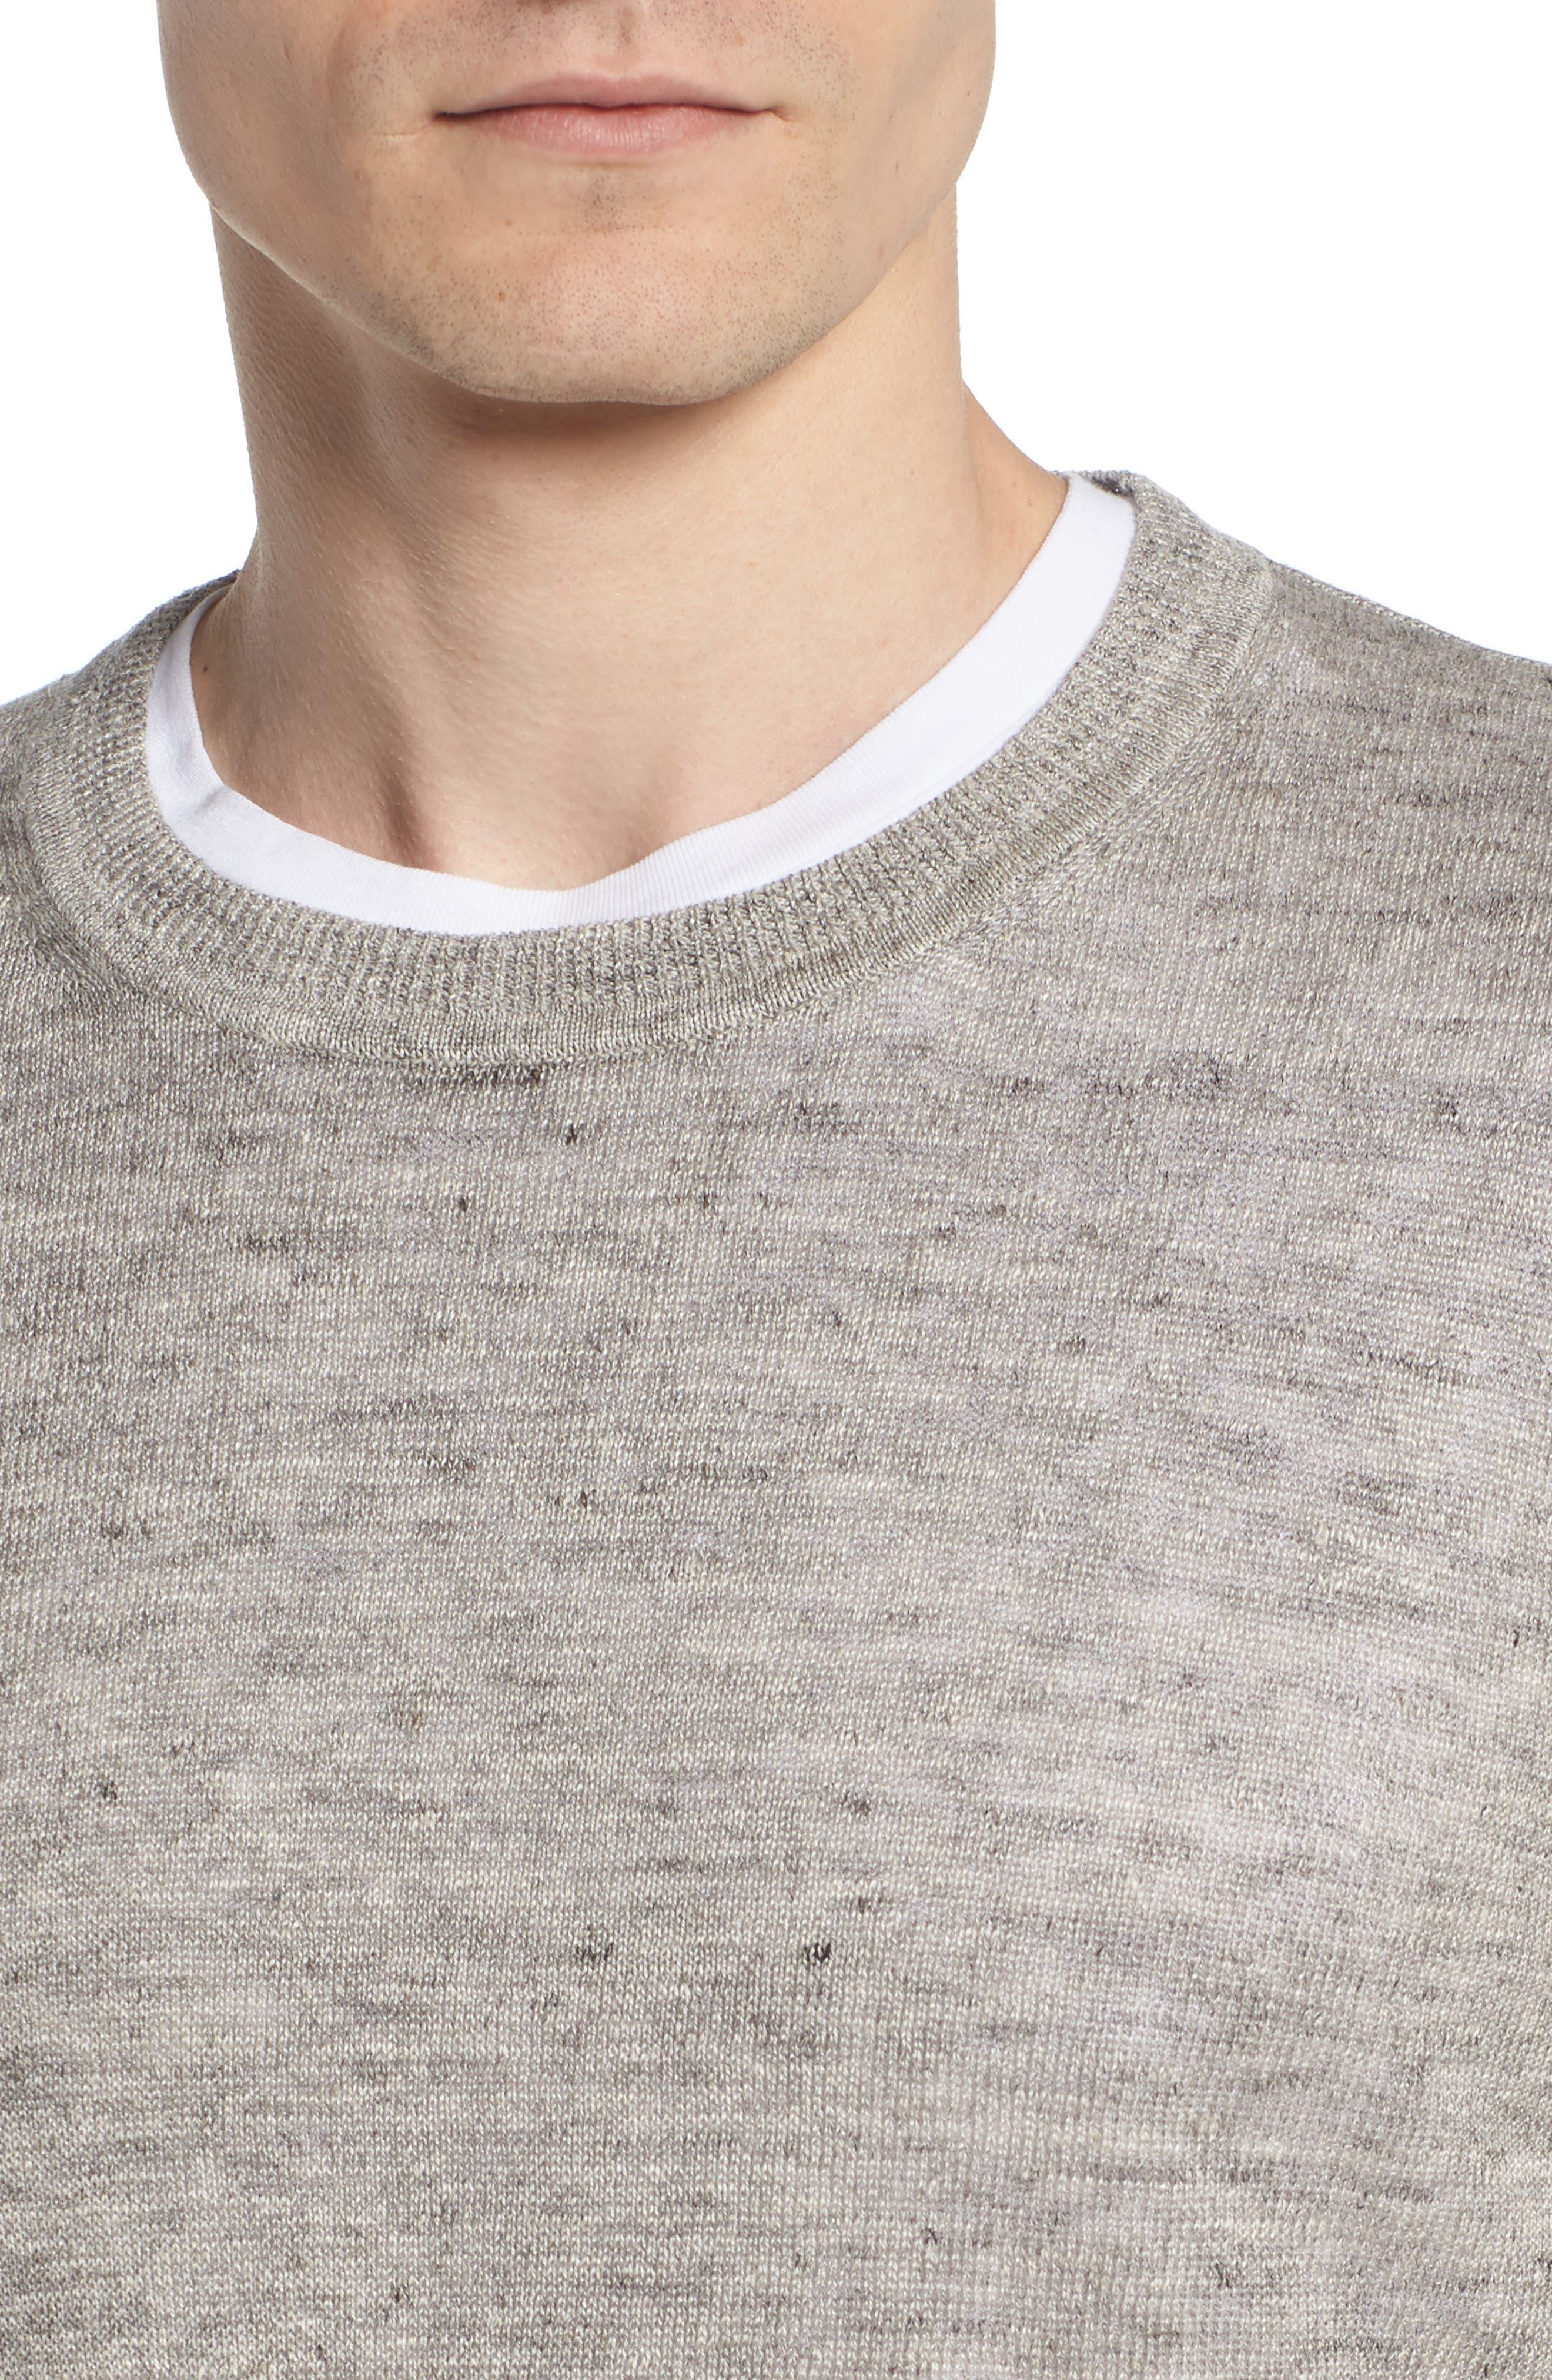 Heyward Long Sleeve T-Shirt,                             Alternate thumbnail 4, color,                             022